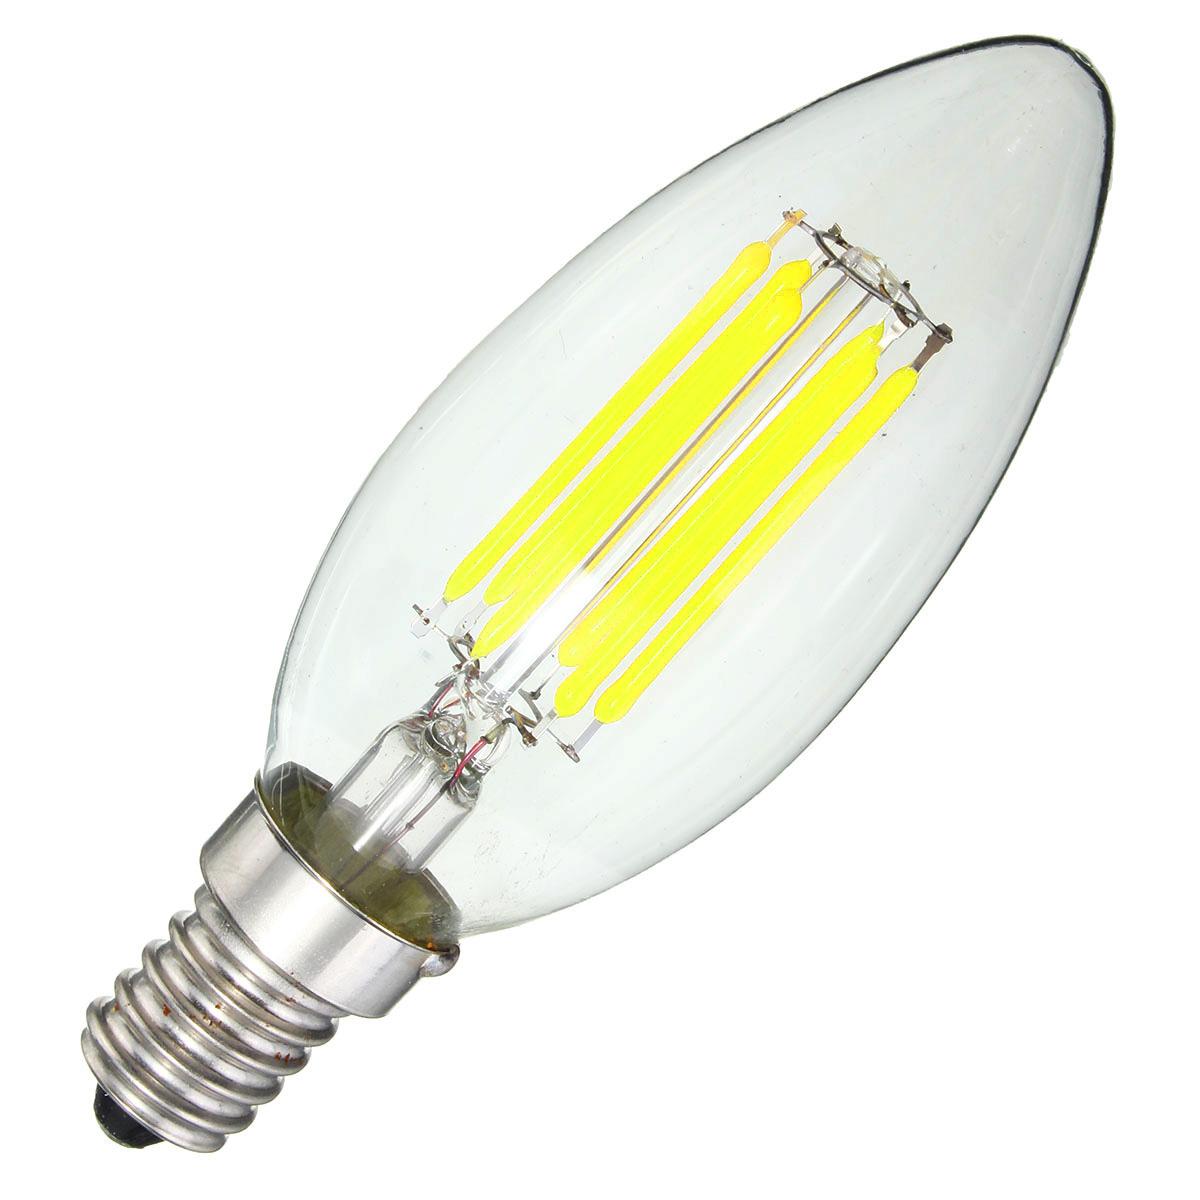 dimmable e14 6w cob 600lm edison filament bulb led light. Black Bedroom Furniture Sets. Home Design Ideas